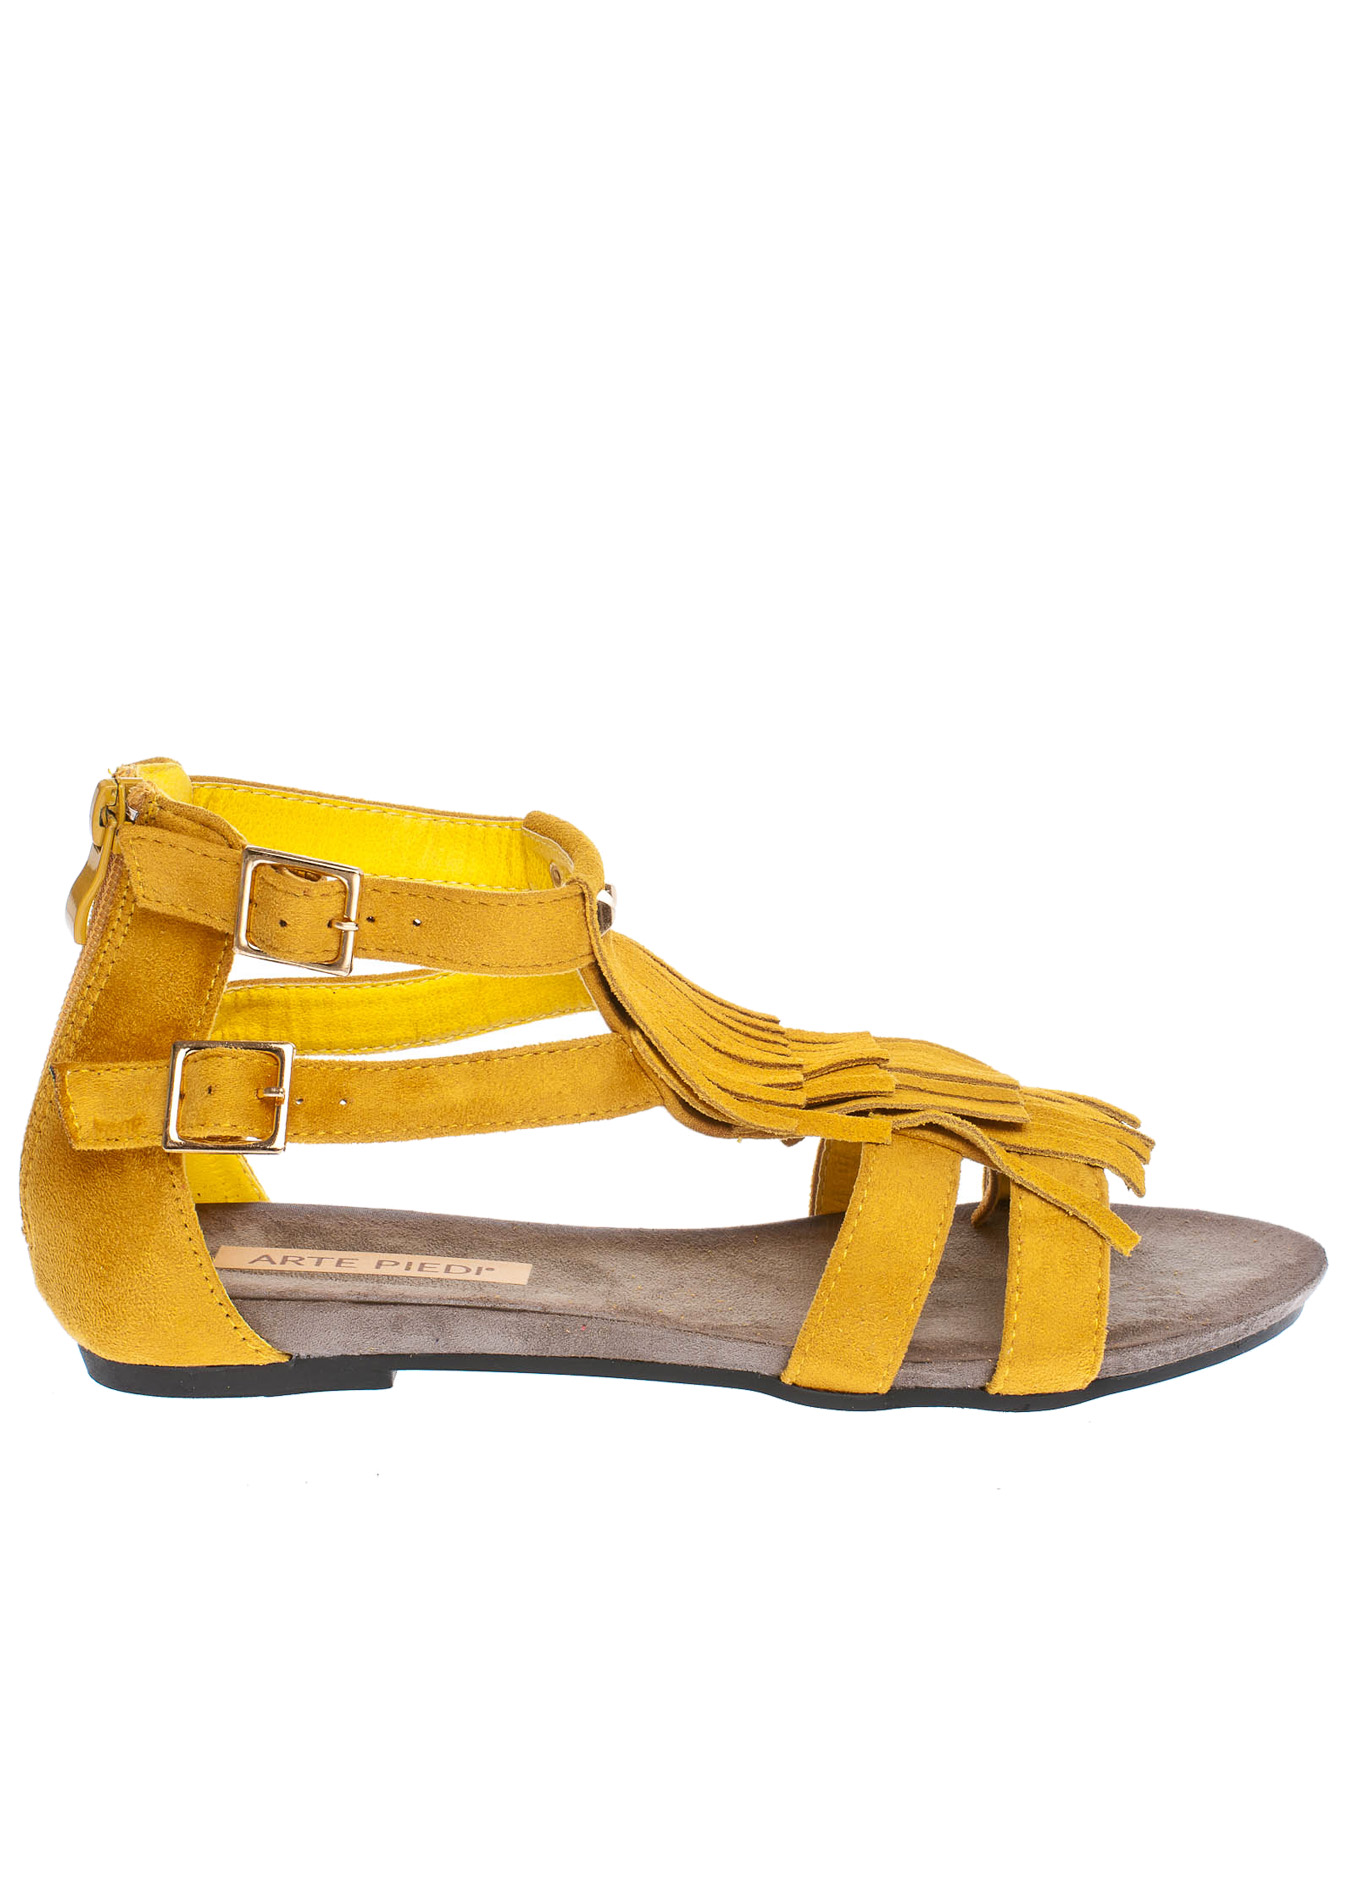 Amelia fringe σανδάλι, κίτρινο παπούτσια